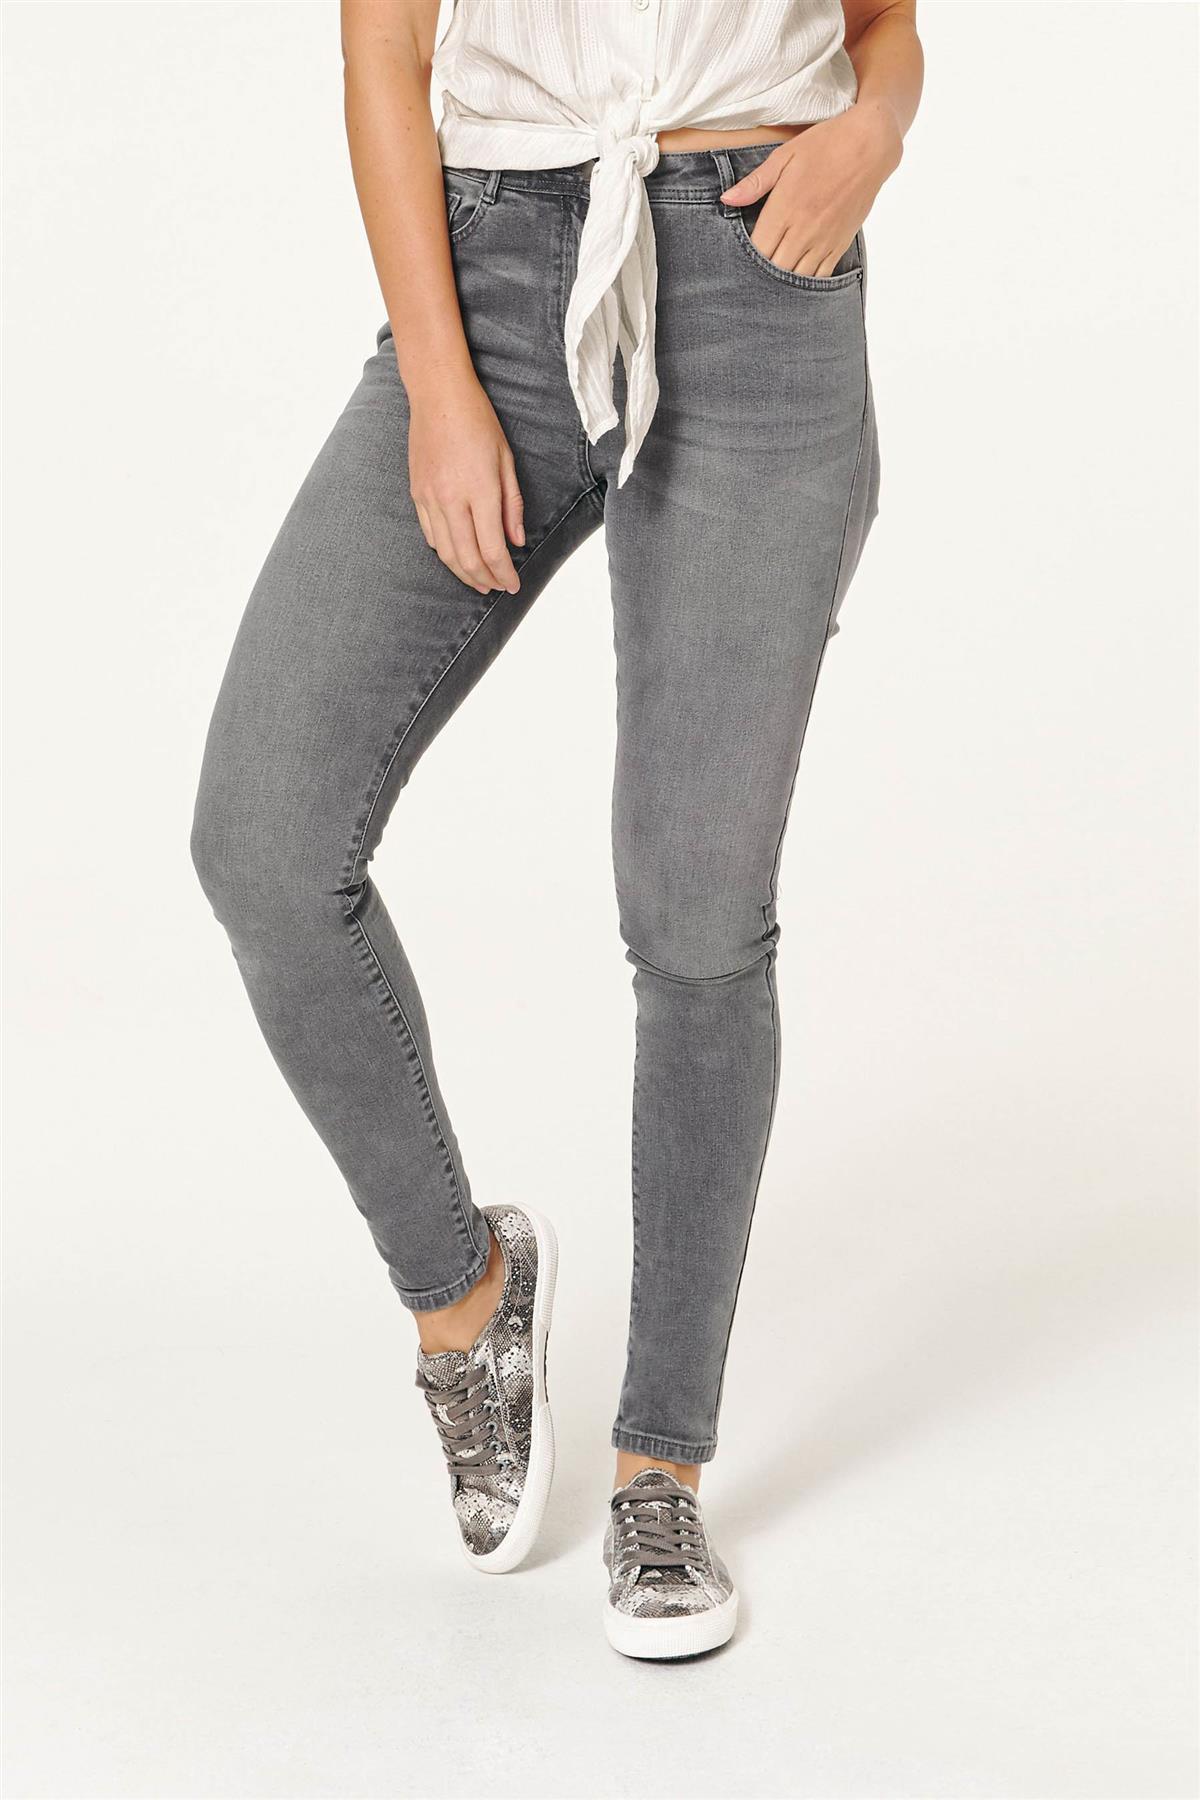 Ladies-Skinny-Jeans-New-ex-Next-Extra-Stretch-Size-6-18-Short-Reg-X-Long-Tall thumbnail 18